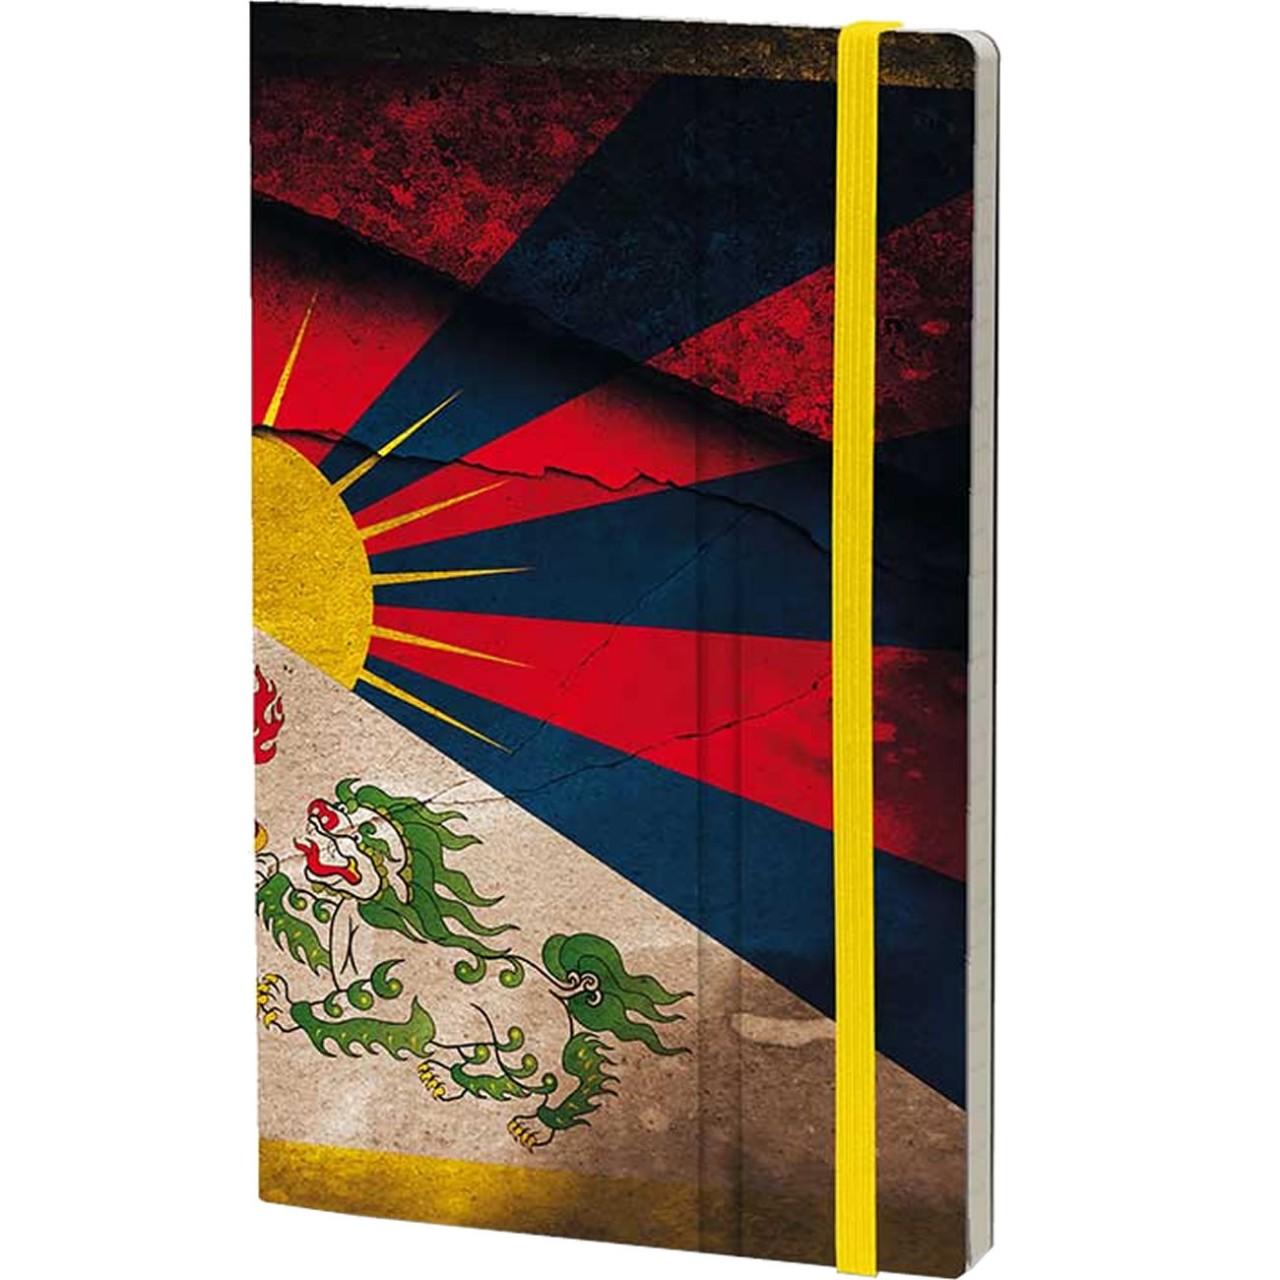 Stifflexible Notizbuch HISTORICAL NOTES 13 x 21 cm 192 S., FREE TIBET (Tibet Flag)